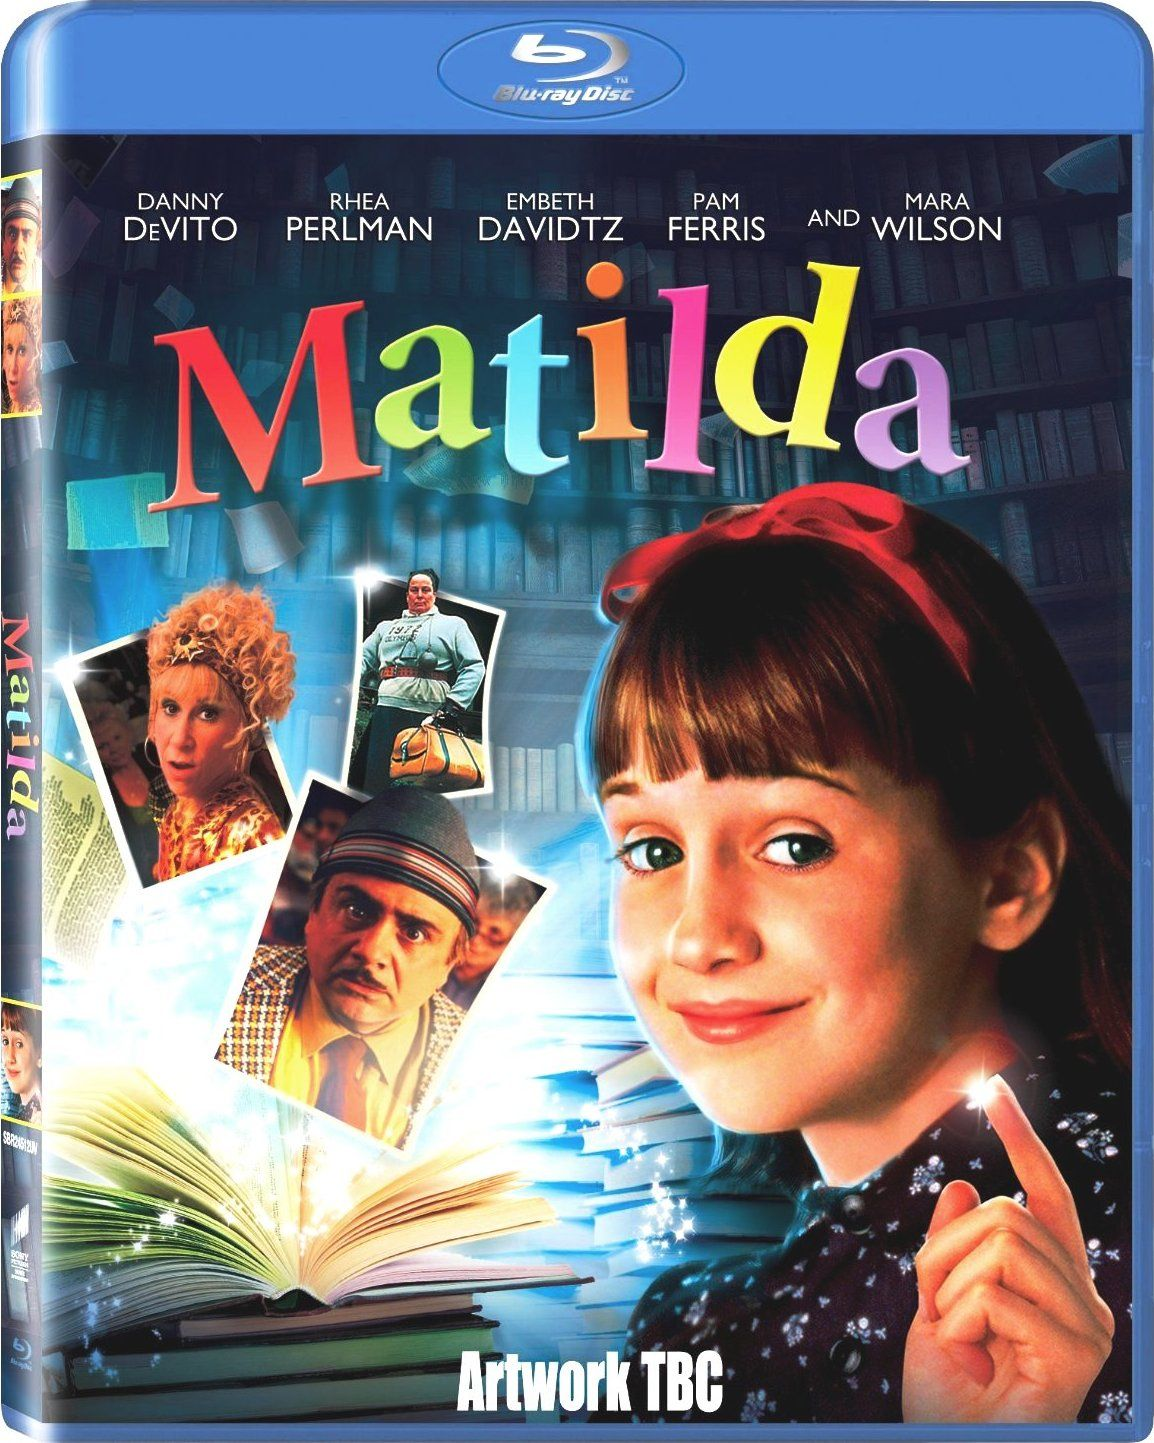 Matilda Blu Ray December 3 2013 Blu Ray Movies Matilda Kids Movies